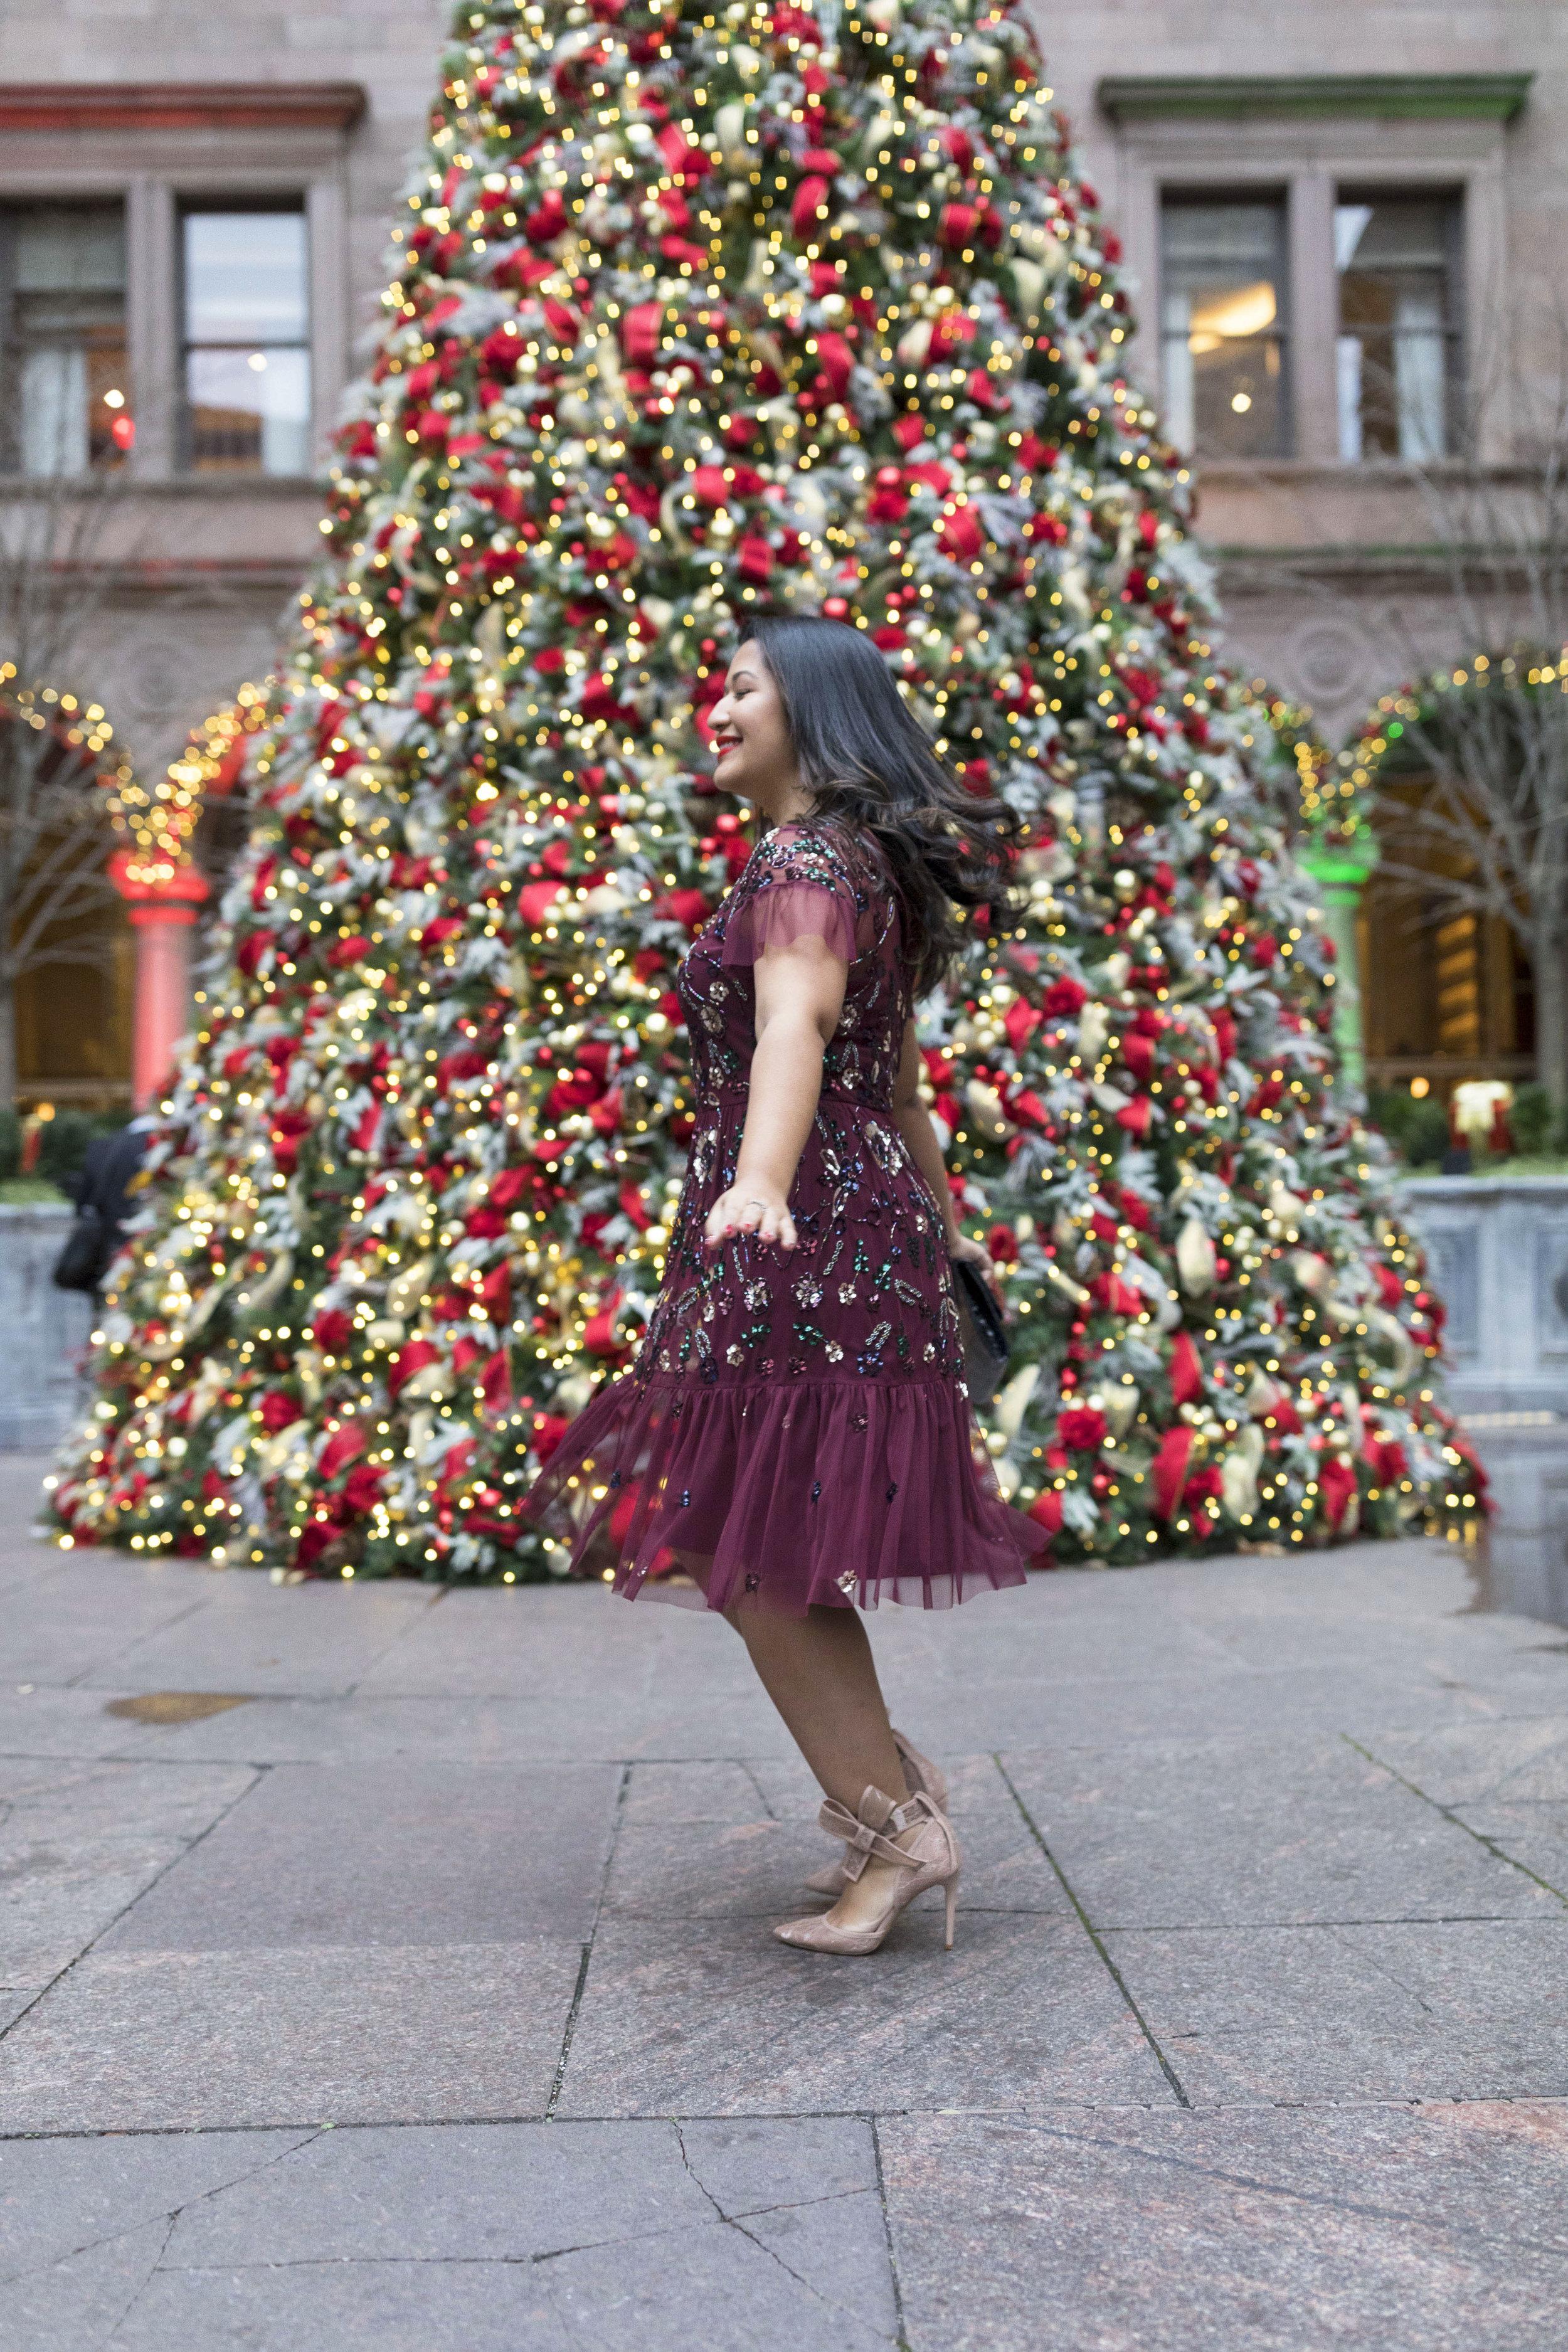 Krity S x Holiday Outfit x Aidan Beaded Burgundy Short Dress12.jpg